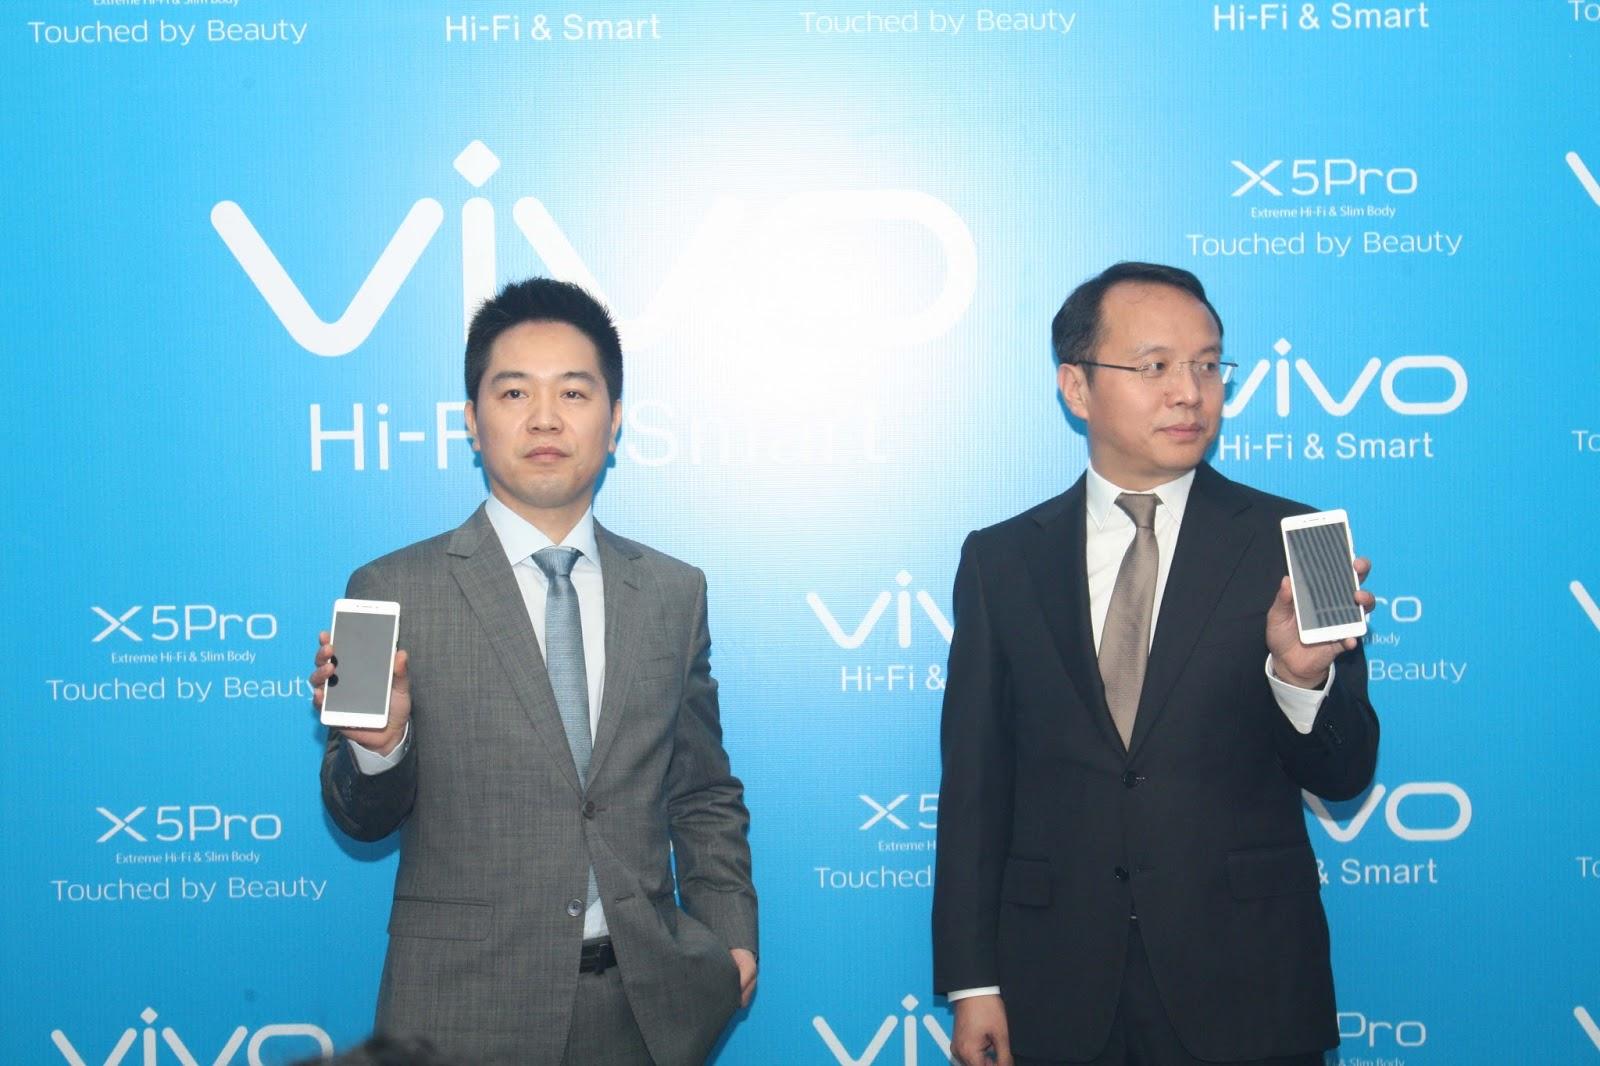 Launching Vivo X5Pro